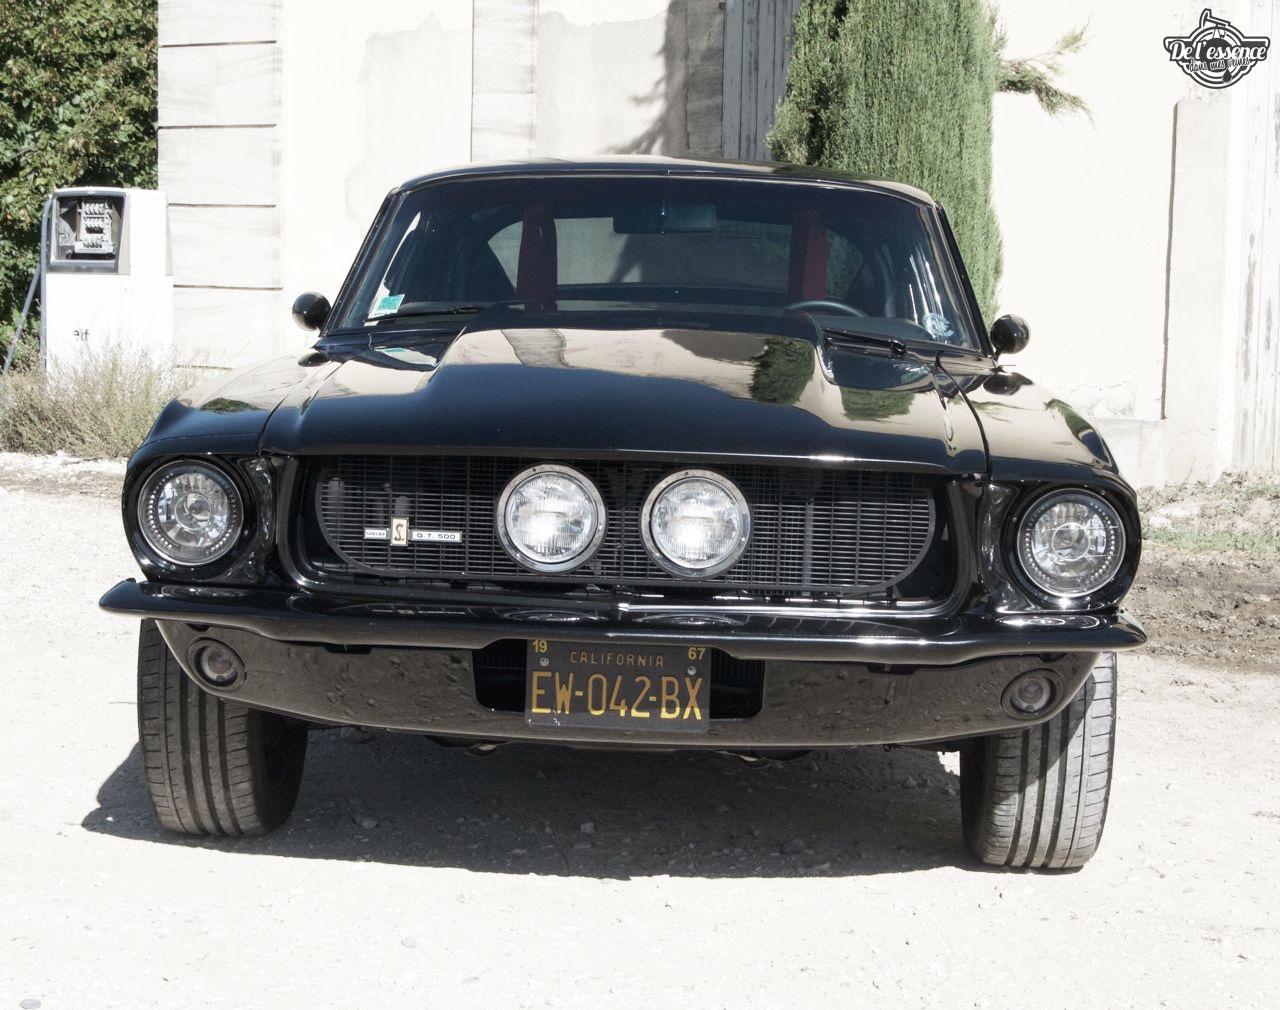 '67 Ford Mustang Shelby GT500 Replica... Bienvenue en enfer ! 34